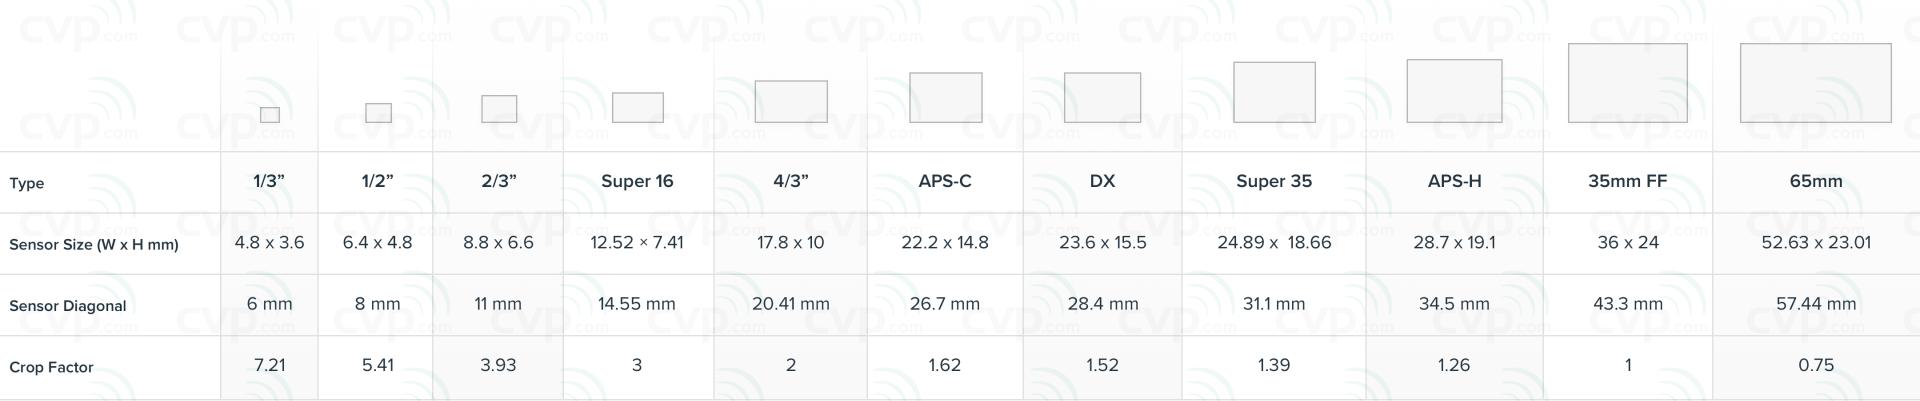 CVP.com - Support - Image sensor size comparison